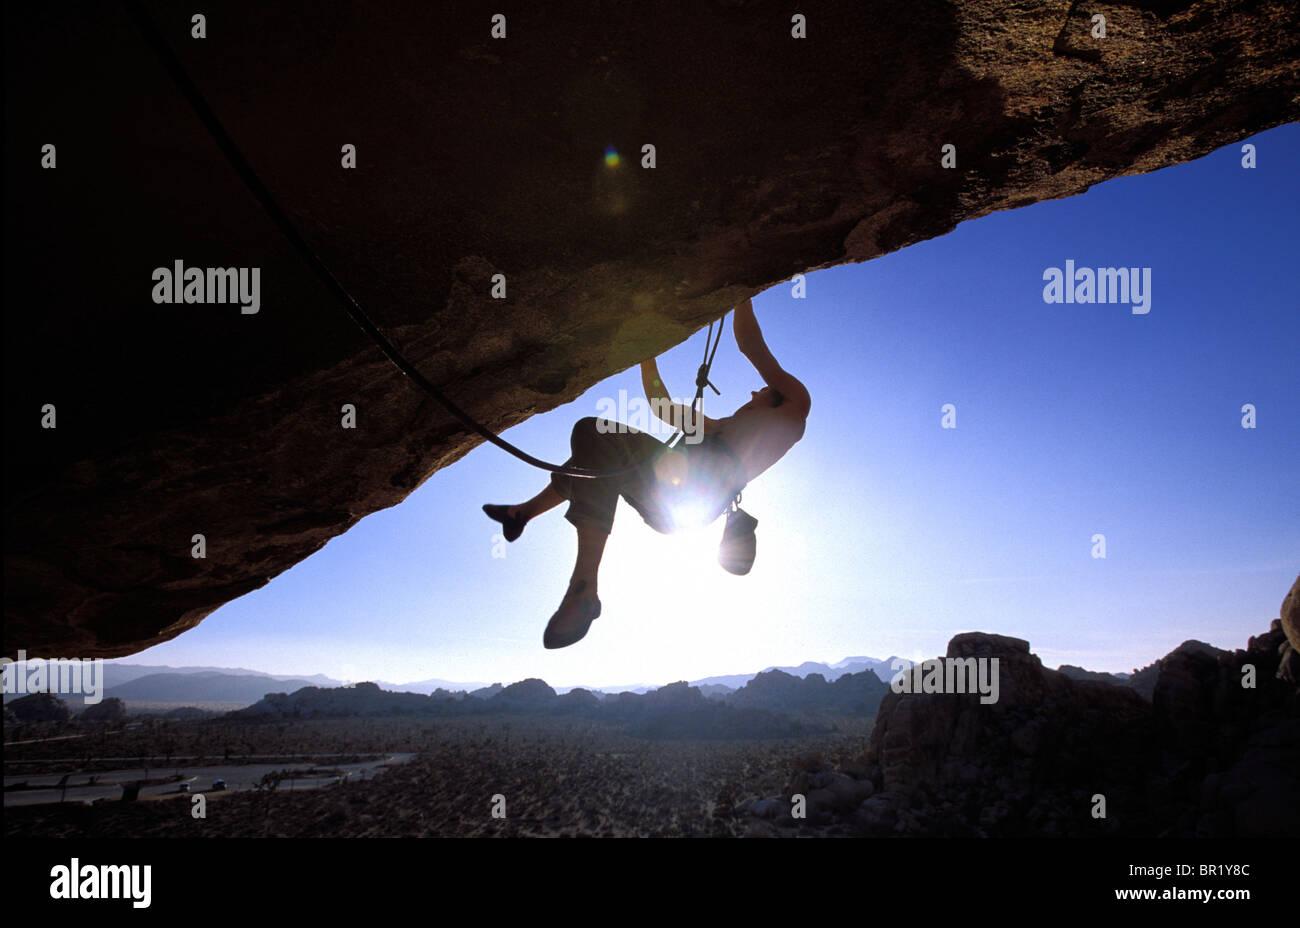 Man climbing on an overhang in Joshua Tree NP, California (Silhouette). - Stock Image